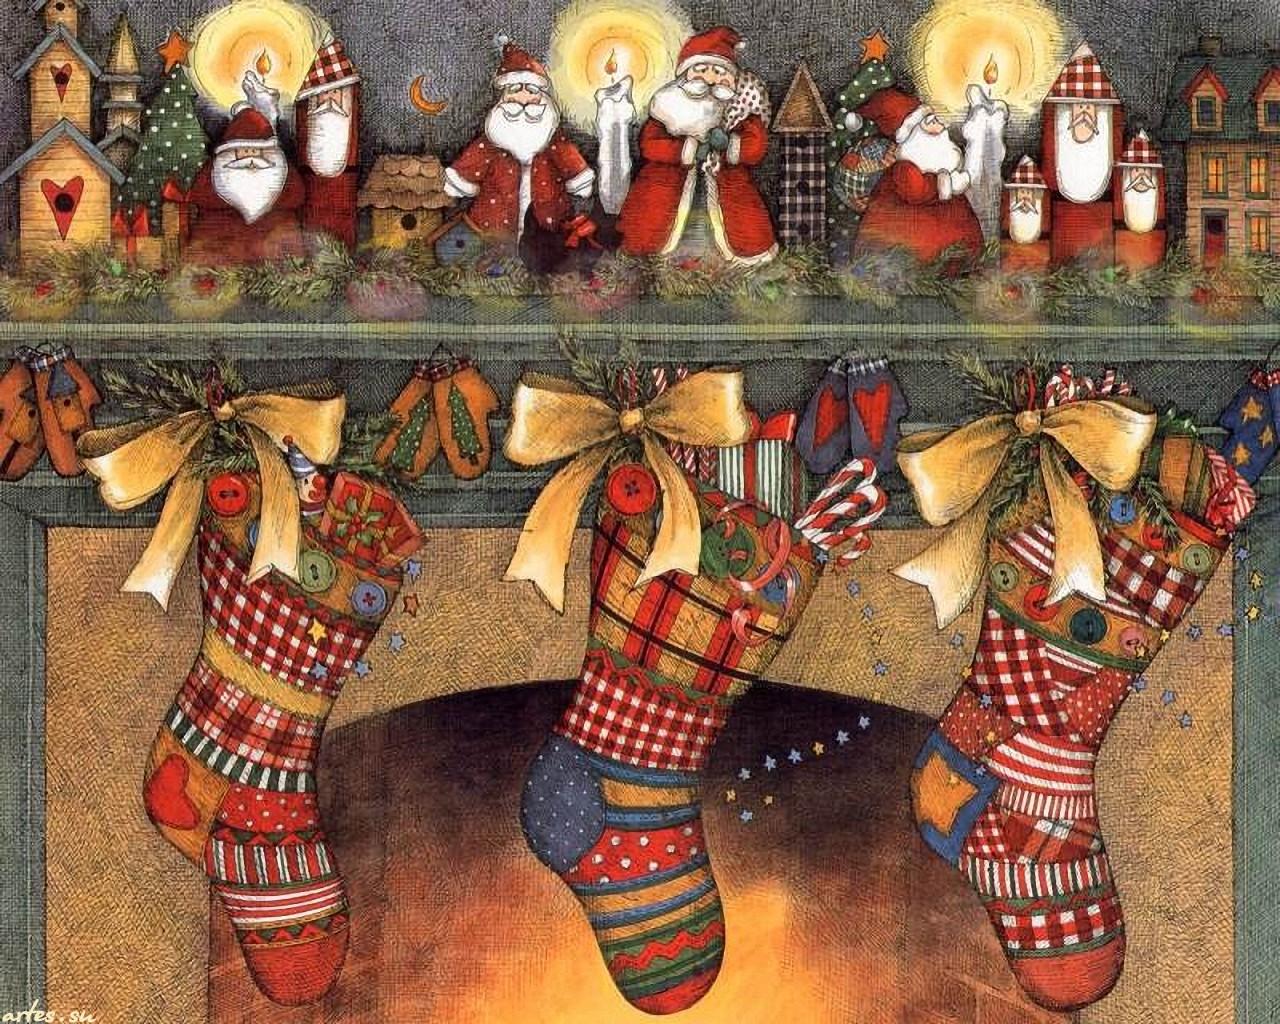 den-svjatogo-nikolaja-tradicii4